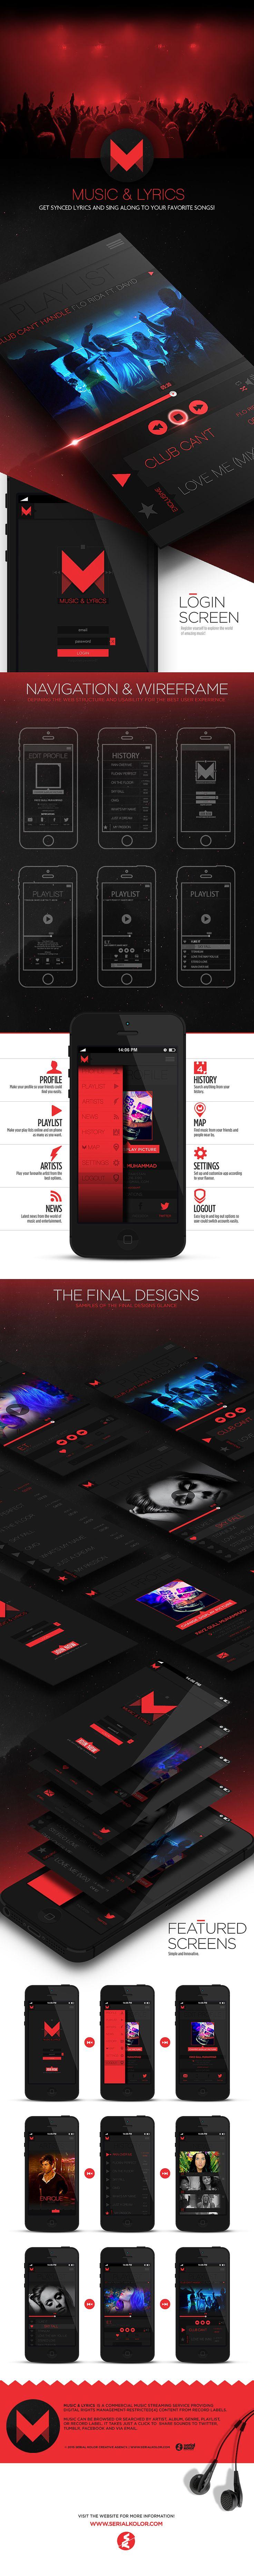 music & lyrics is the conceptual ui/app design